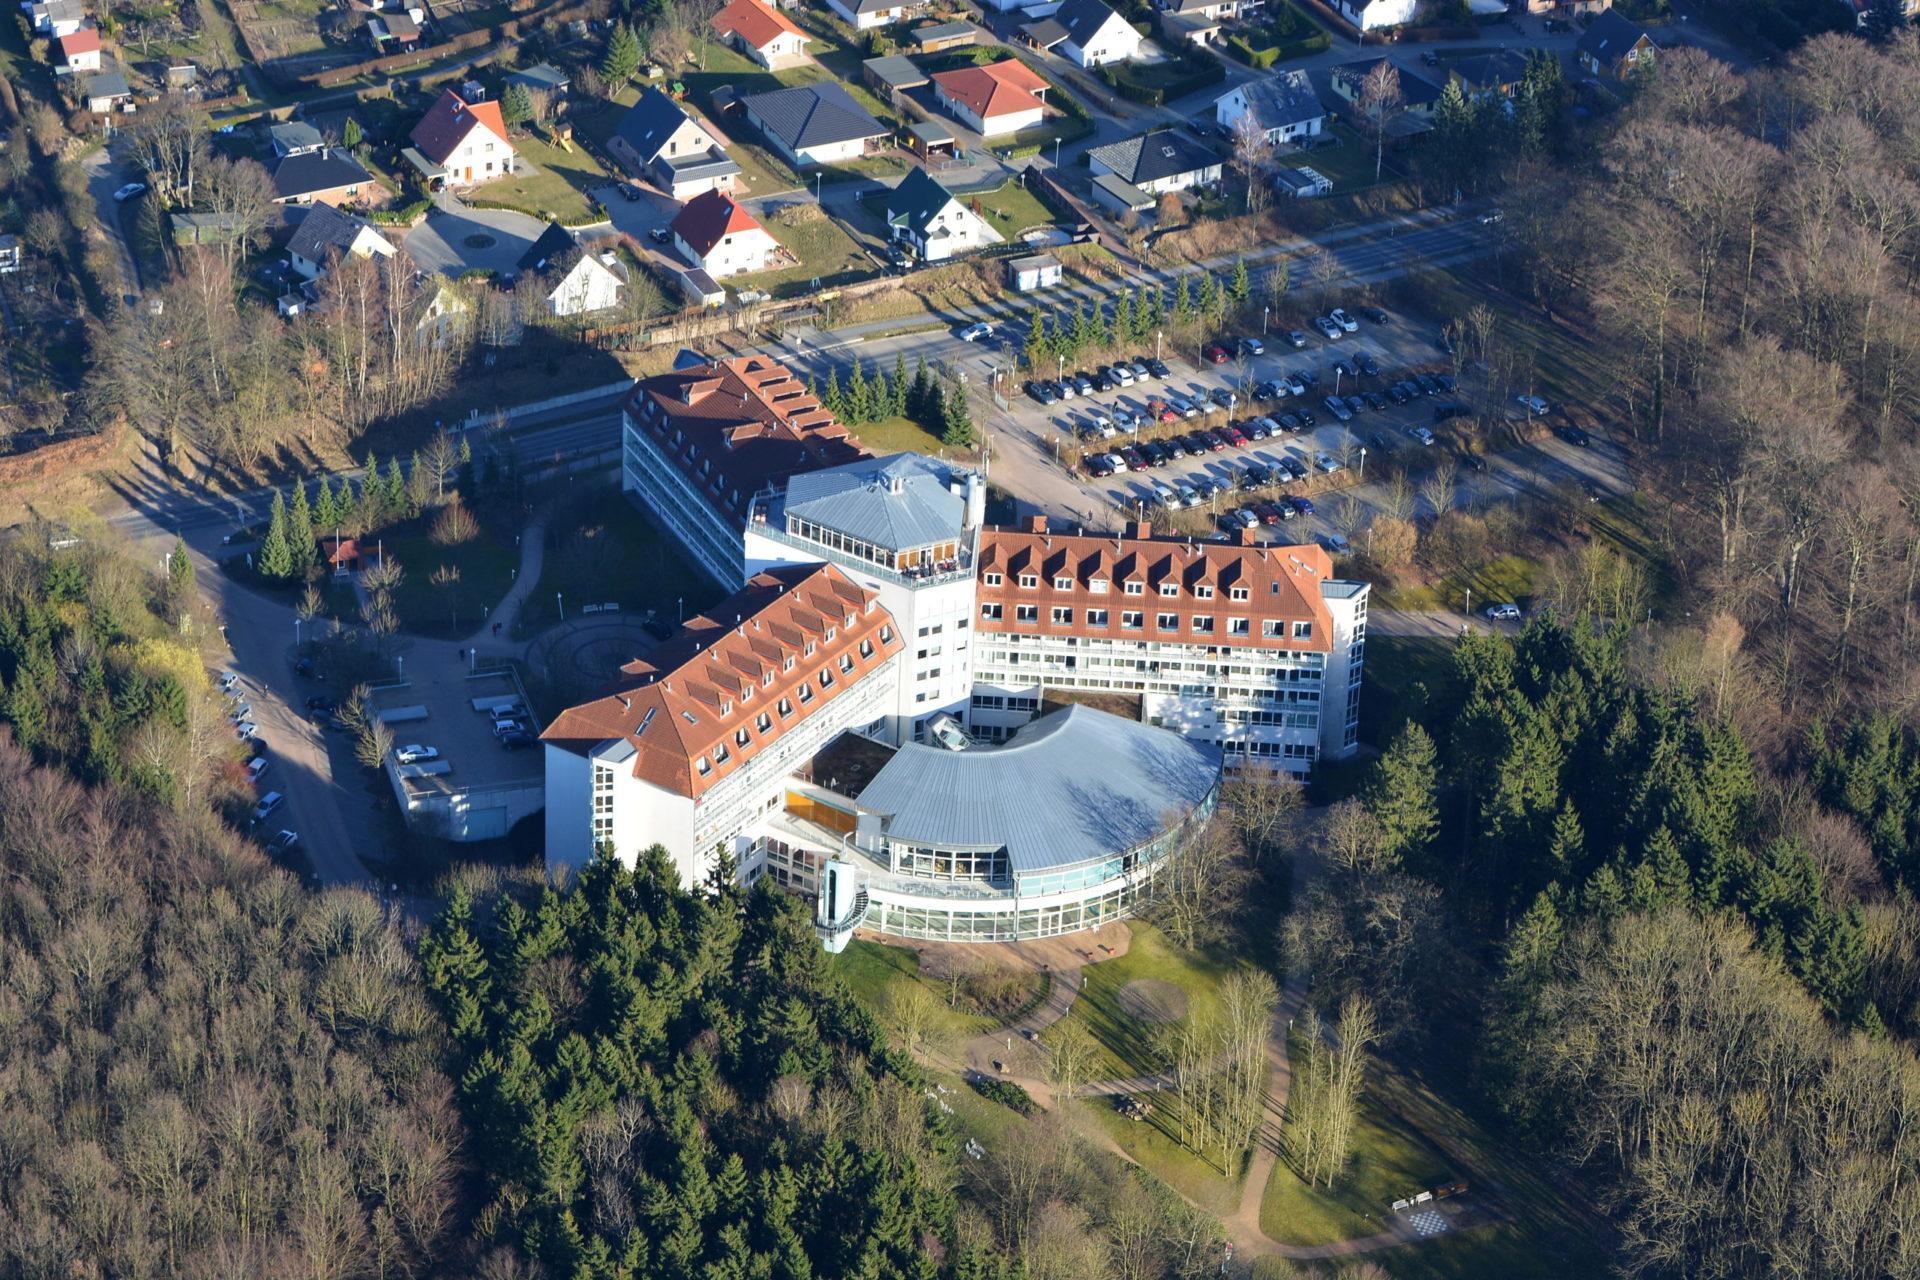 Luftbild Moorbadklinik Bad Doberan